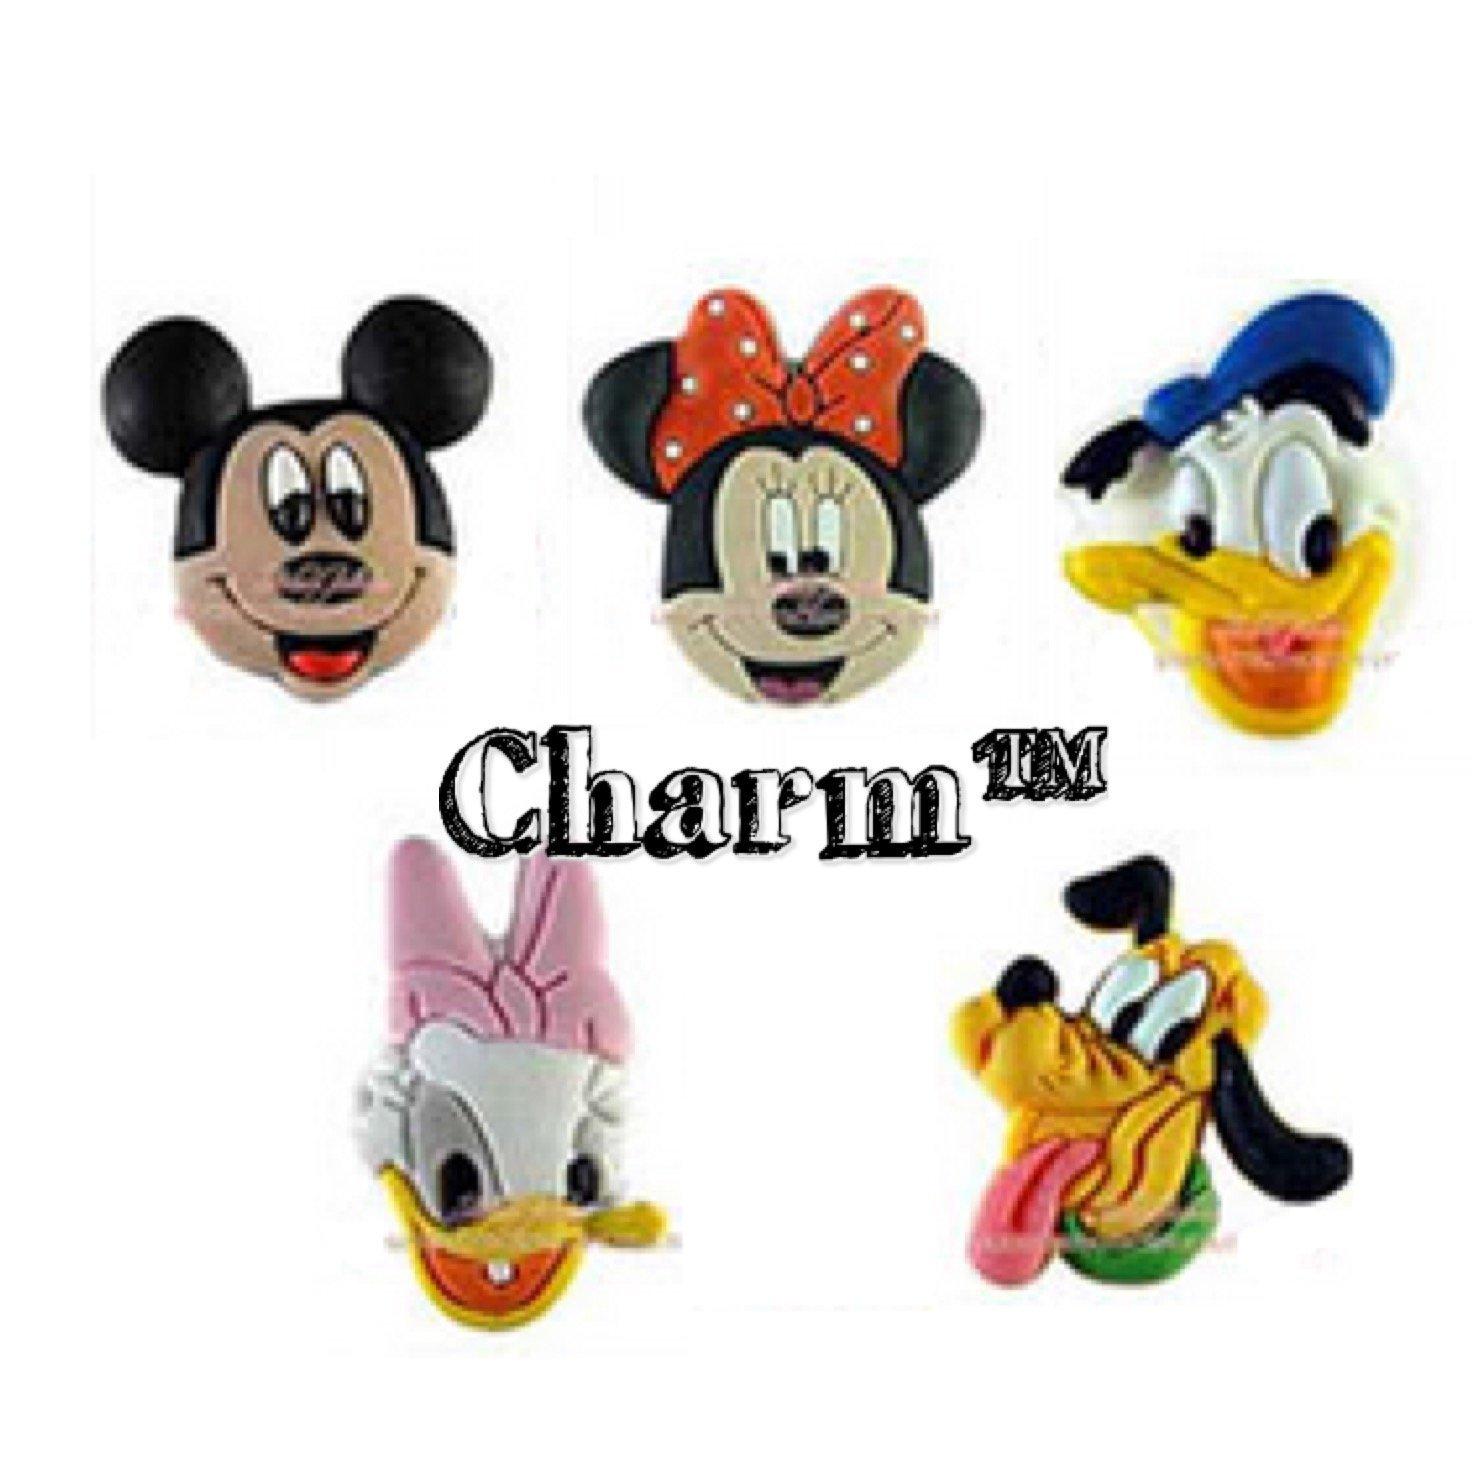 ca02123dd Get Quotations · Disney Mickey Minnie Mouse Jibbitz (Generic) Set of 5 PVC  Jibbitz Crocs Natives Party